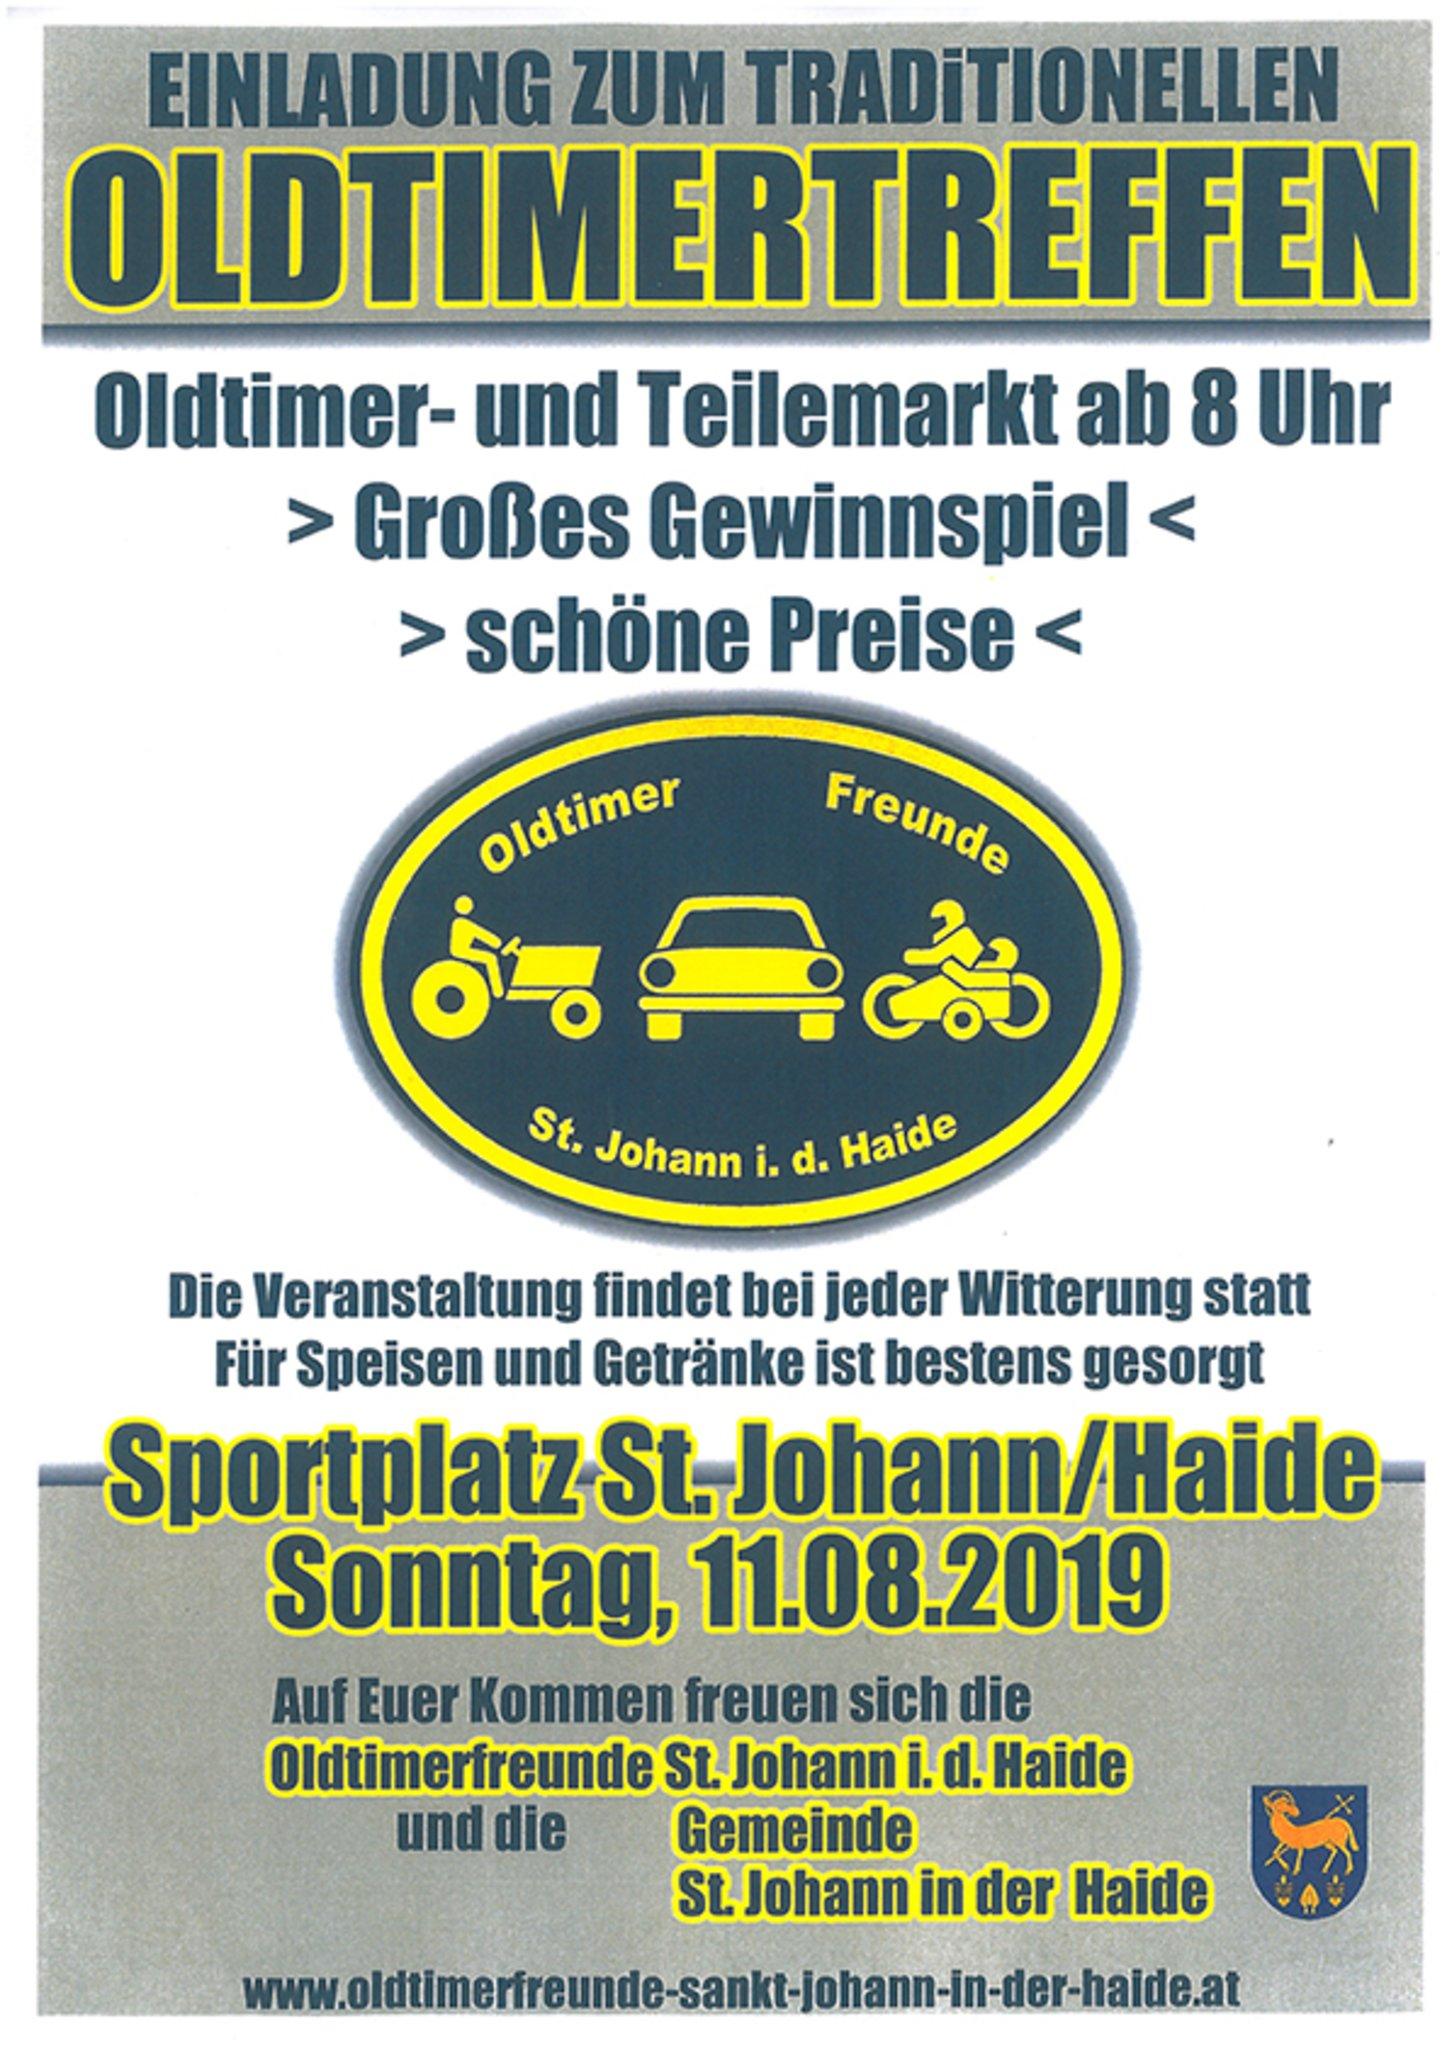 Faschingsparty - Sankt Johann in der Haide - Bezirk Hartberg